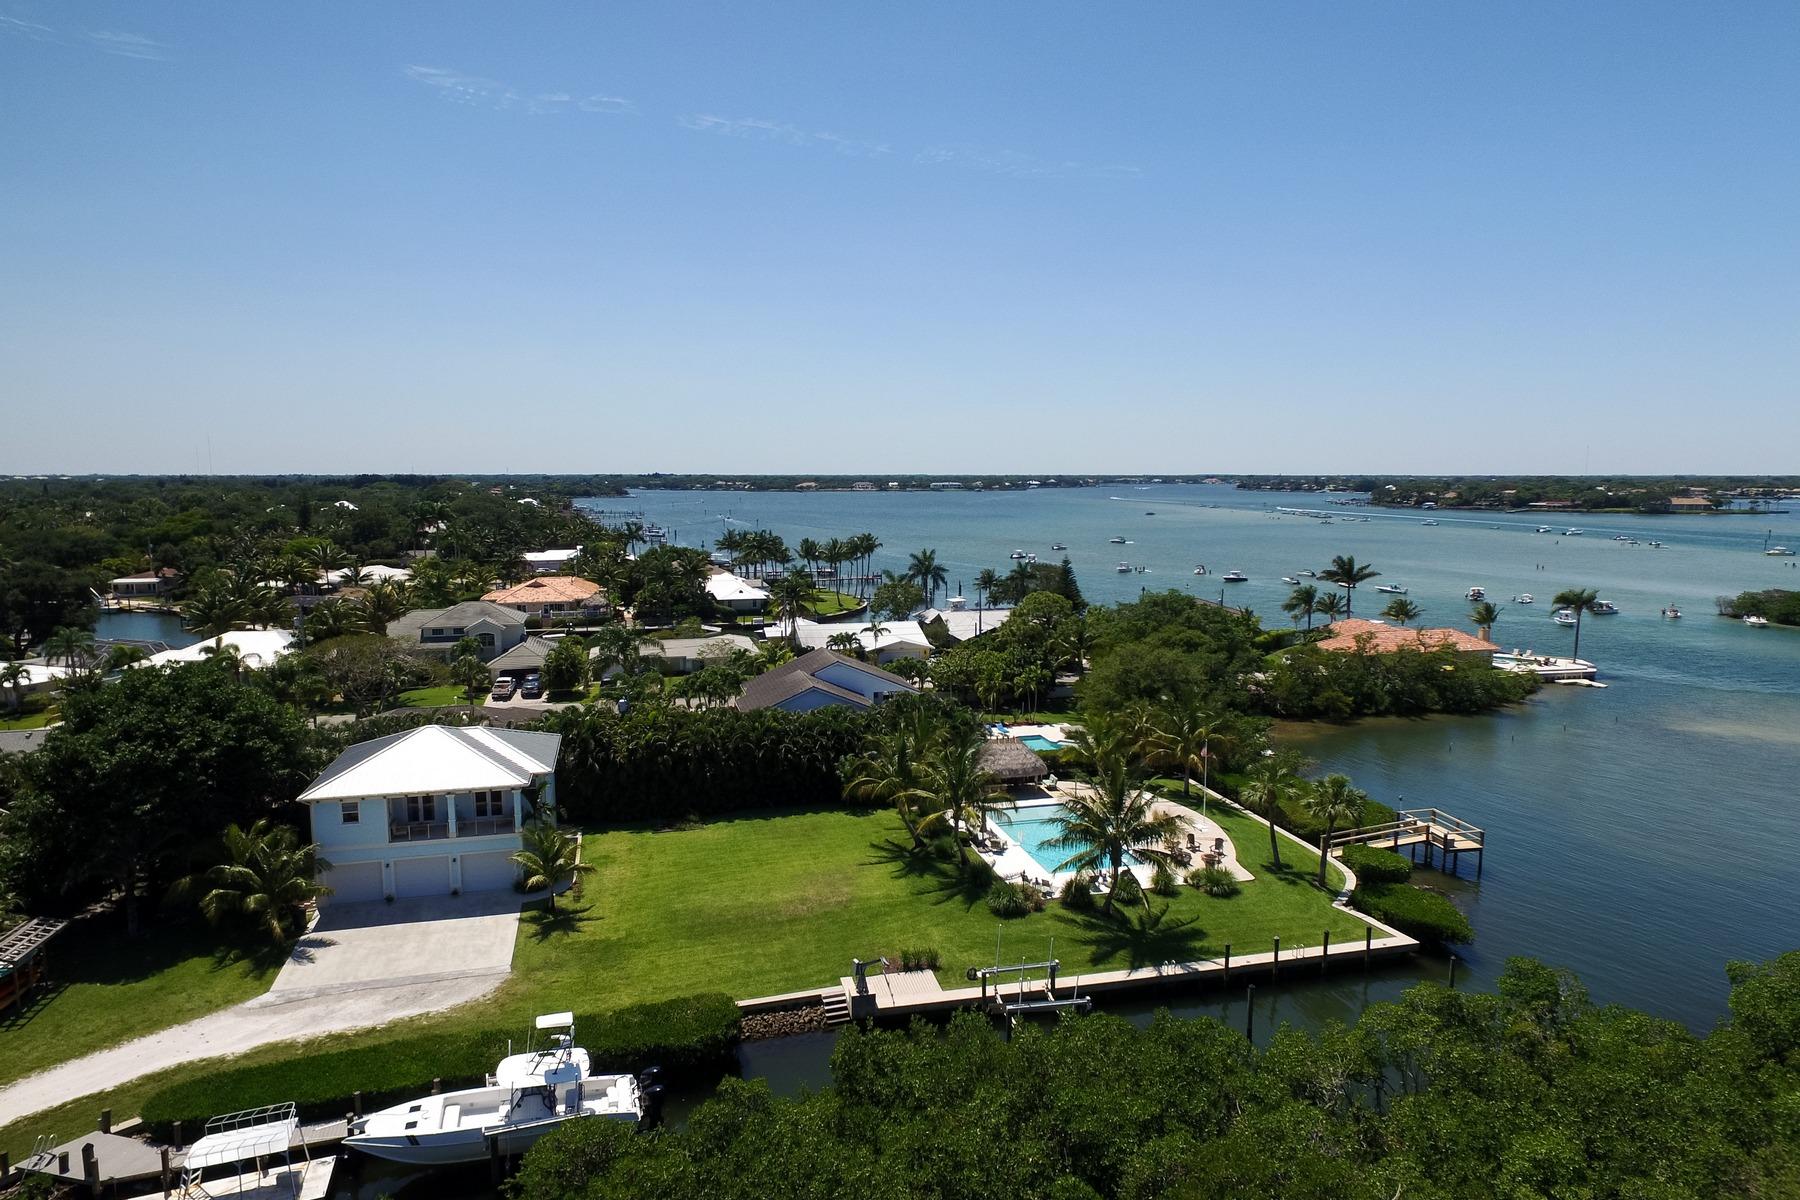 Single Family Home for Sale at 207 Killane Drive Jupiter, Florida 33458 United States